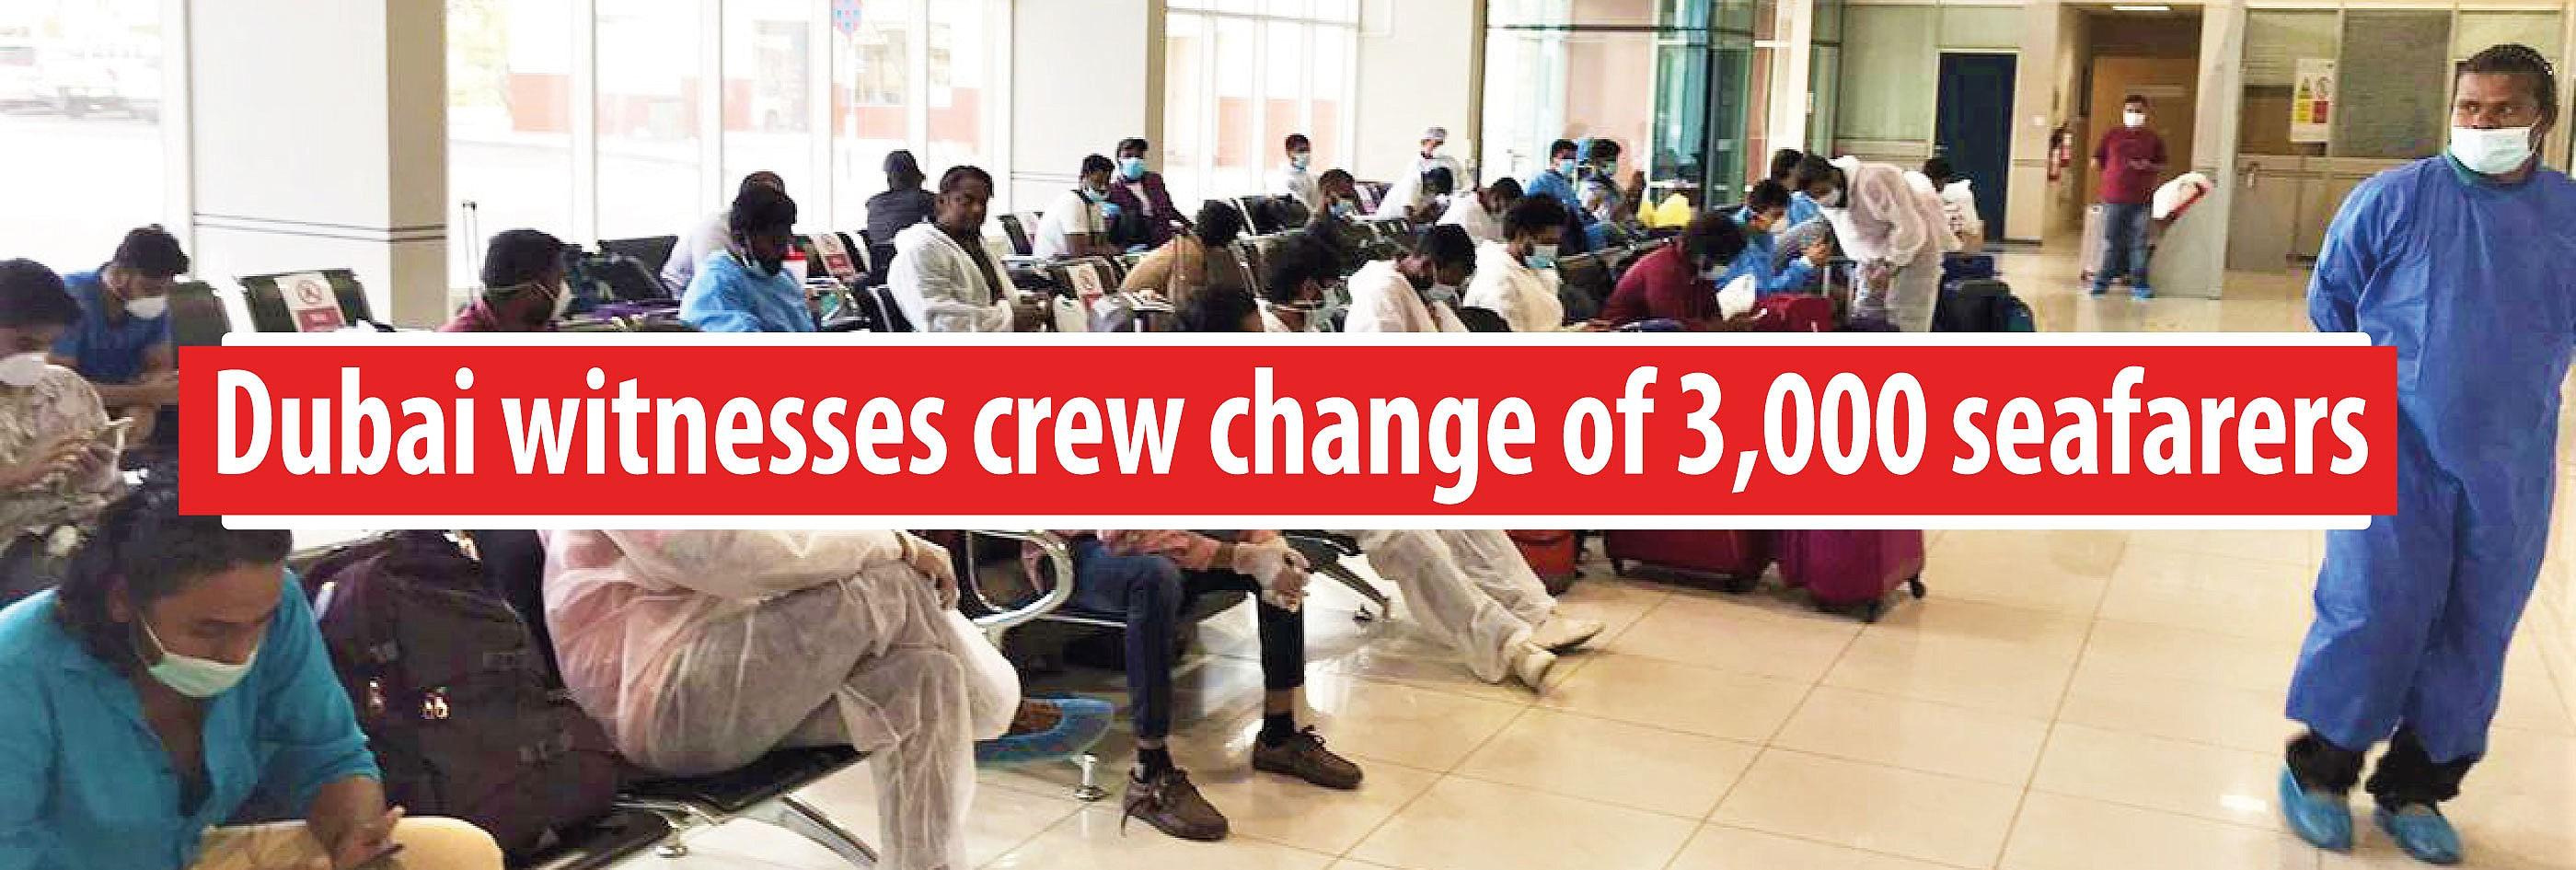 Dubai witnesses crew change of 3,000 seafarers